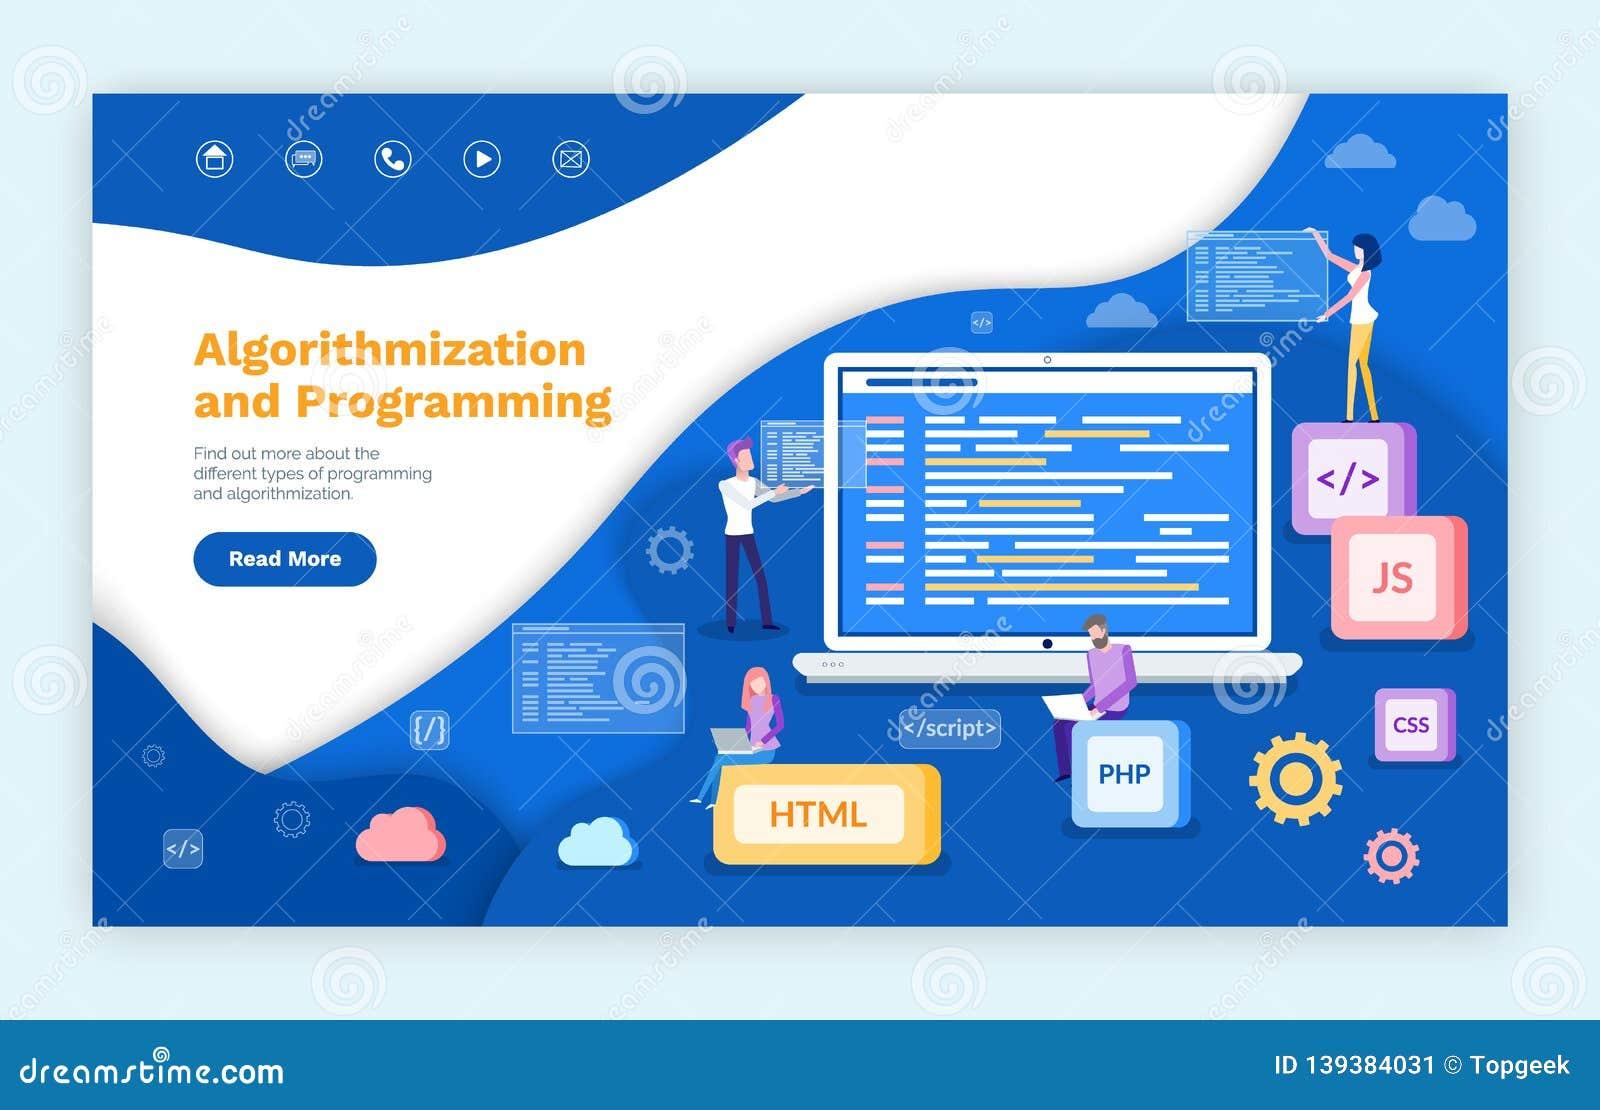 Algorithmization And Programming, People Coders Stock Vector